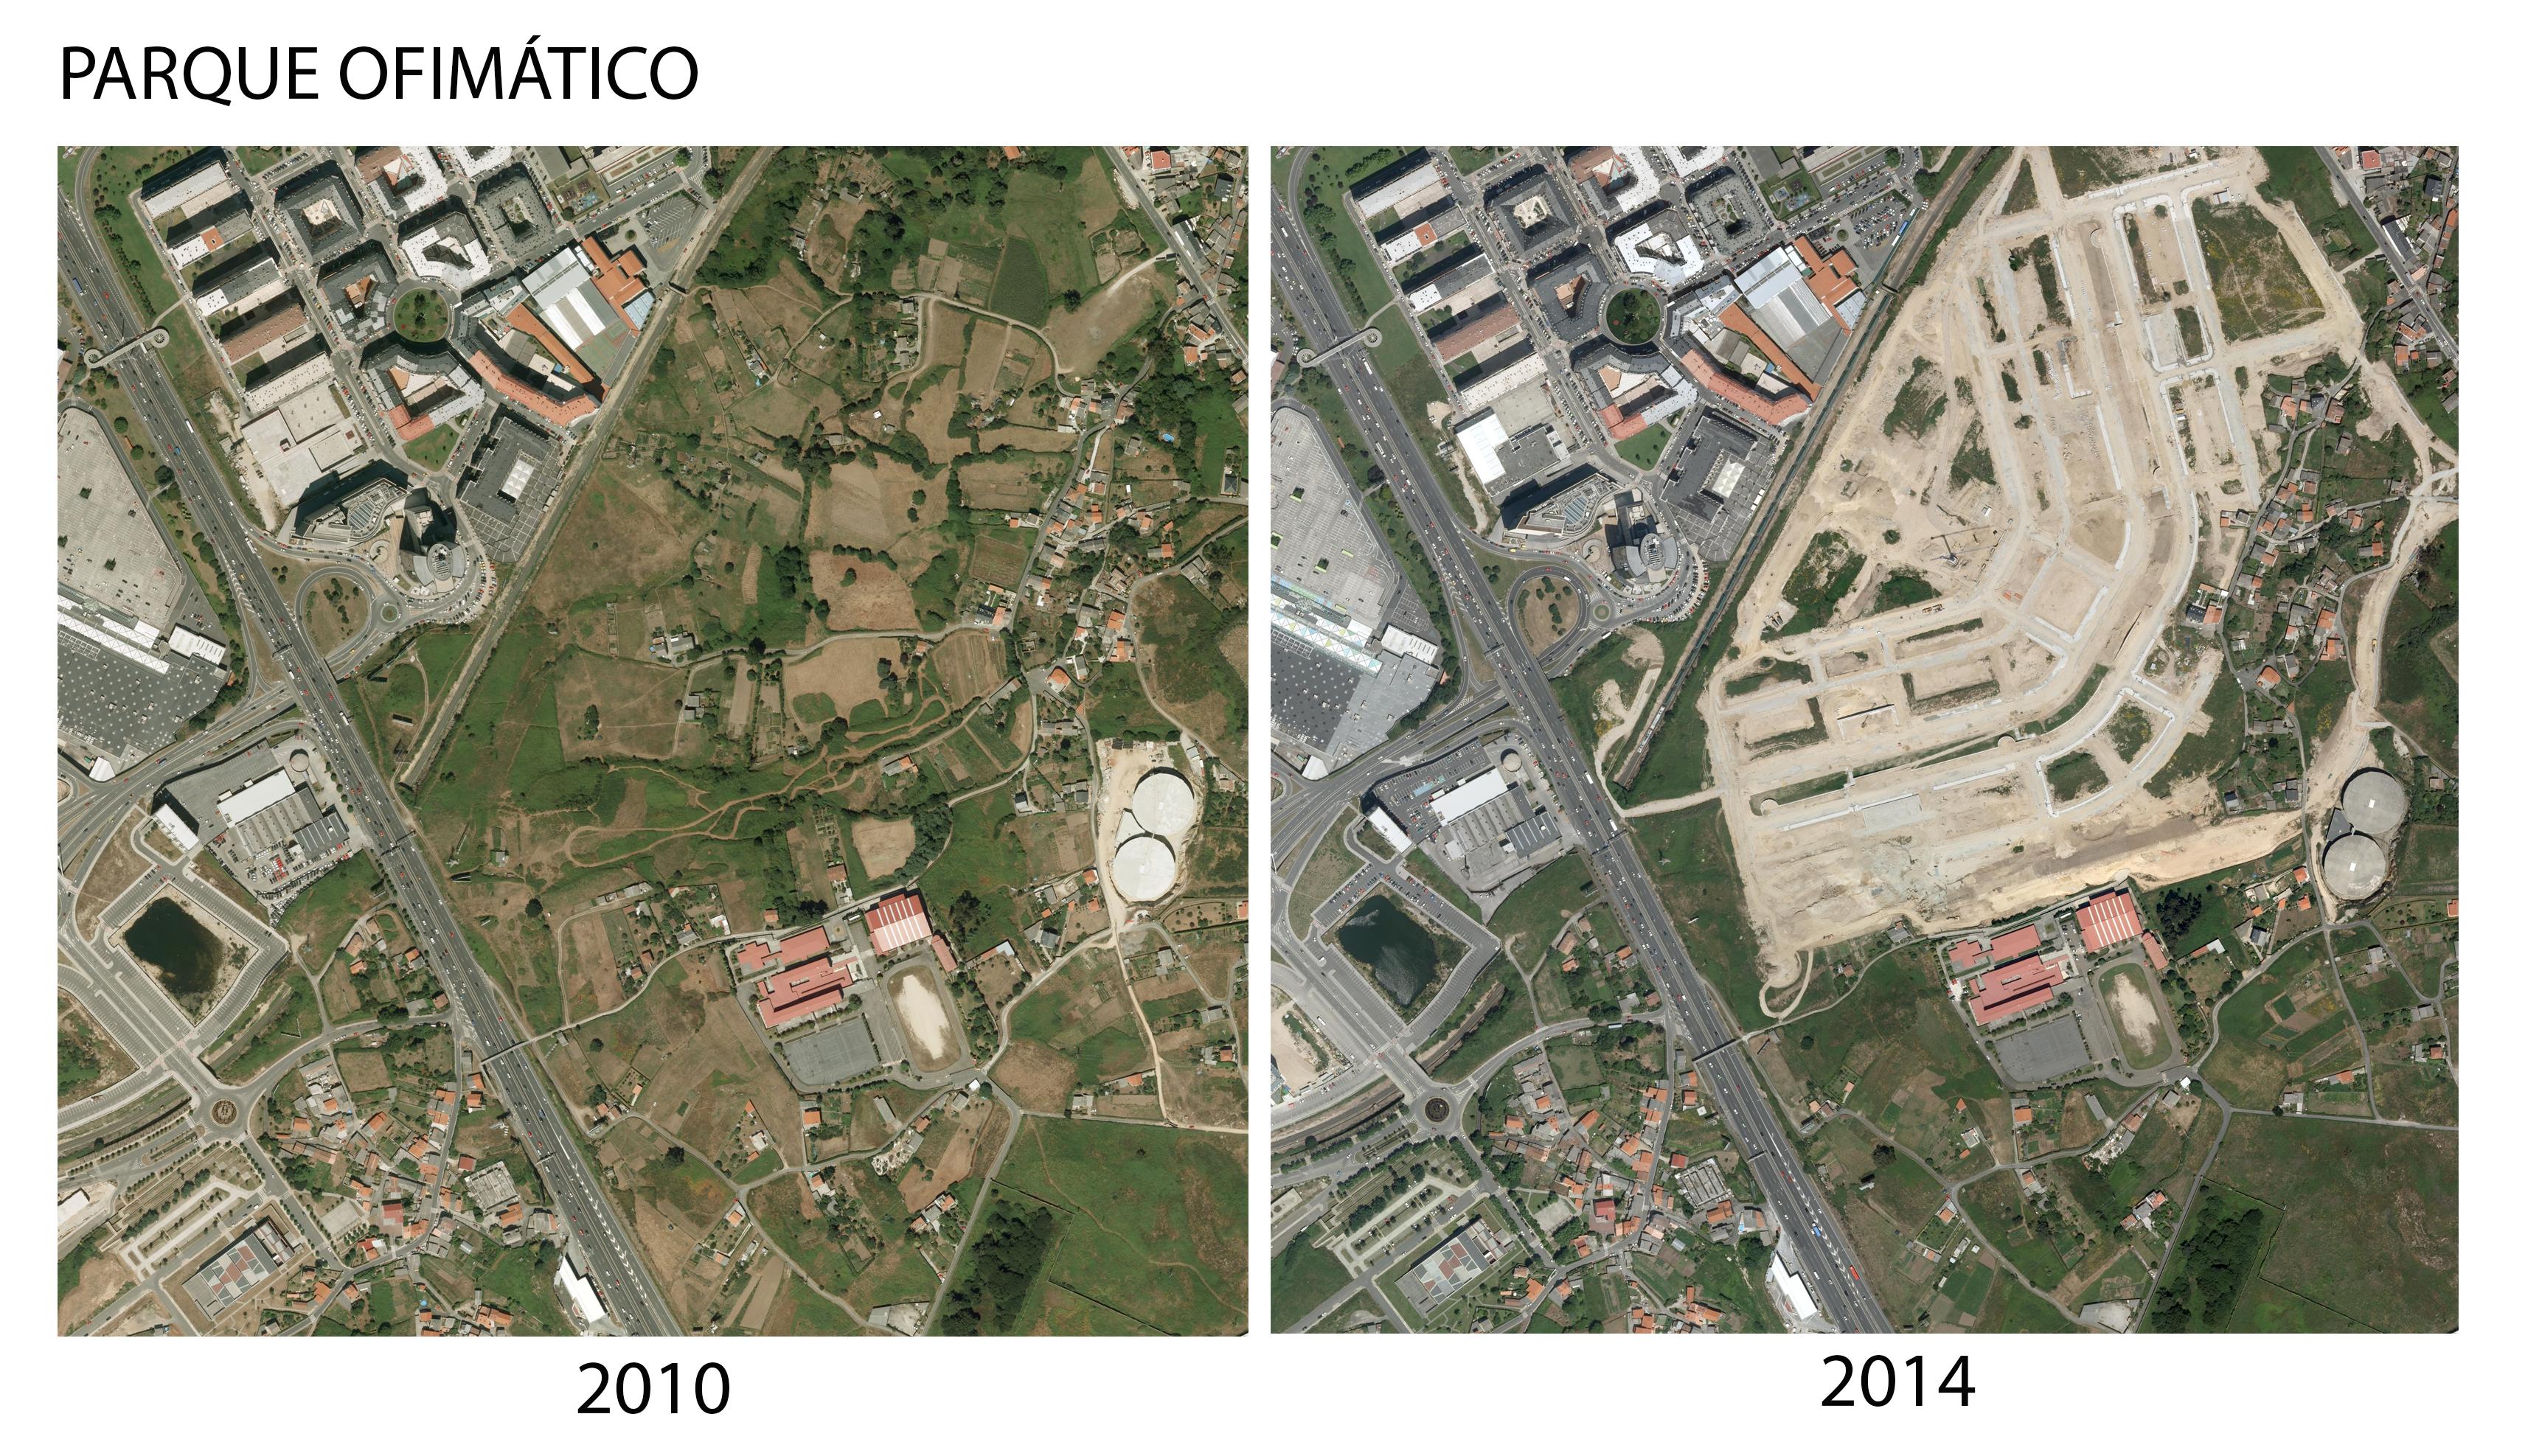 Comparativa dos terreos do parque Ofimático 2010-2014